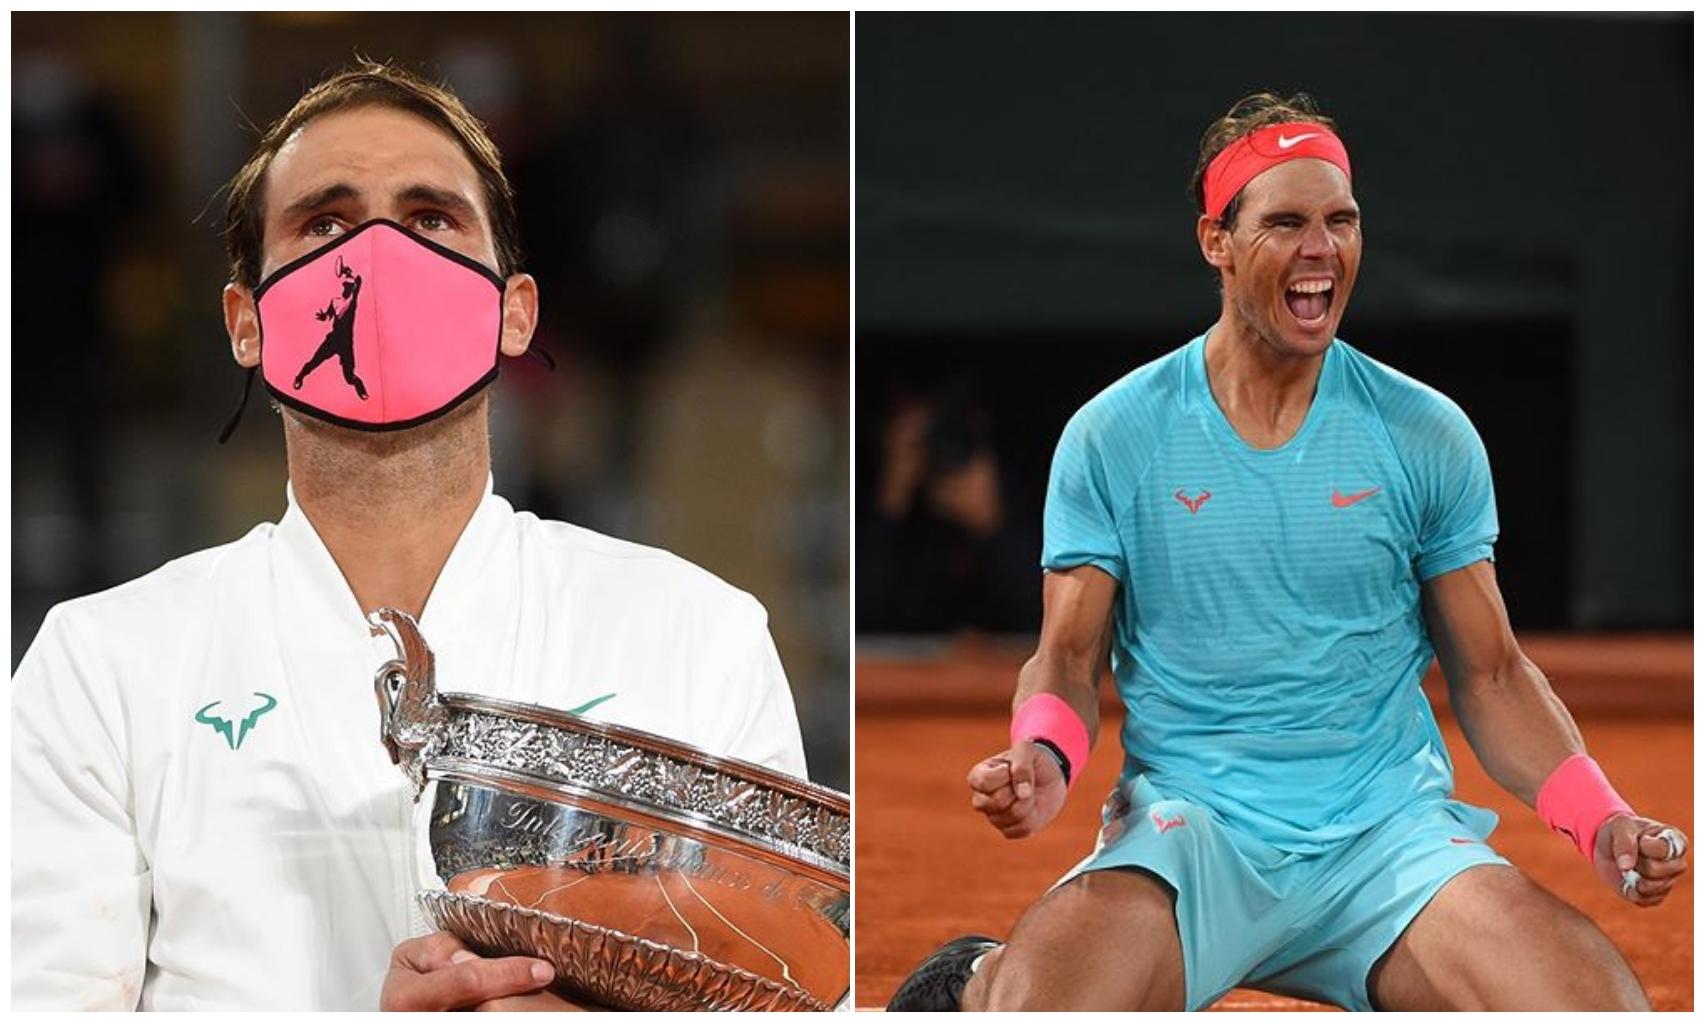 Rafael Nadal clinch 13th Roland Garros to equal Roger Federer's 20 Grand Slam titles